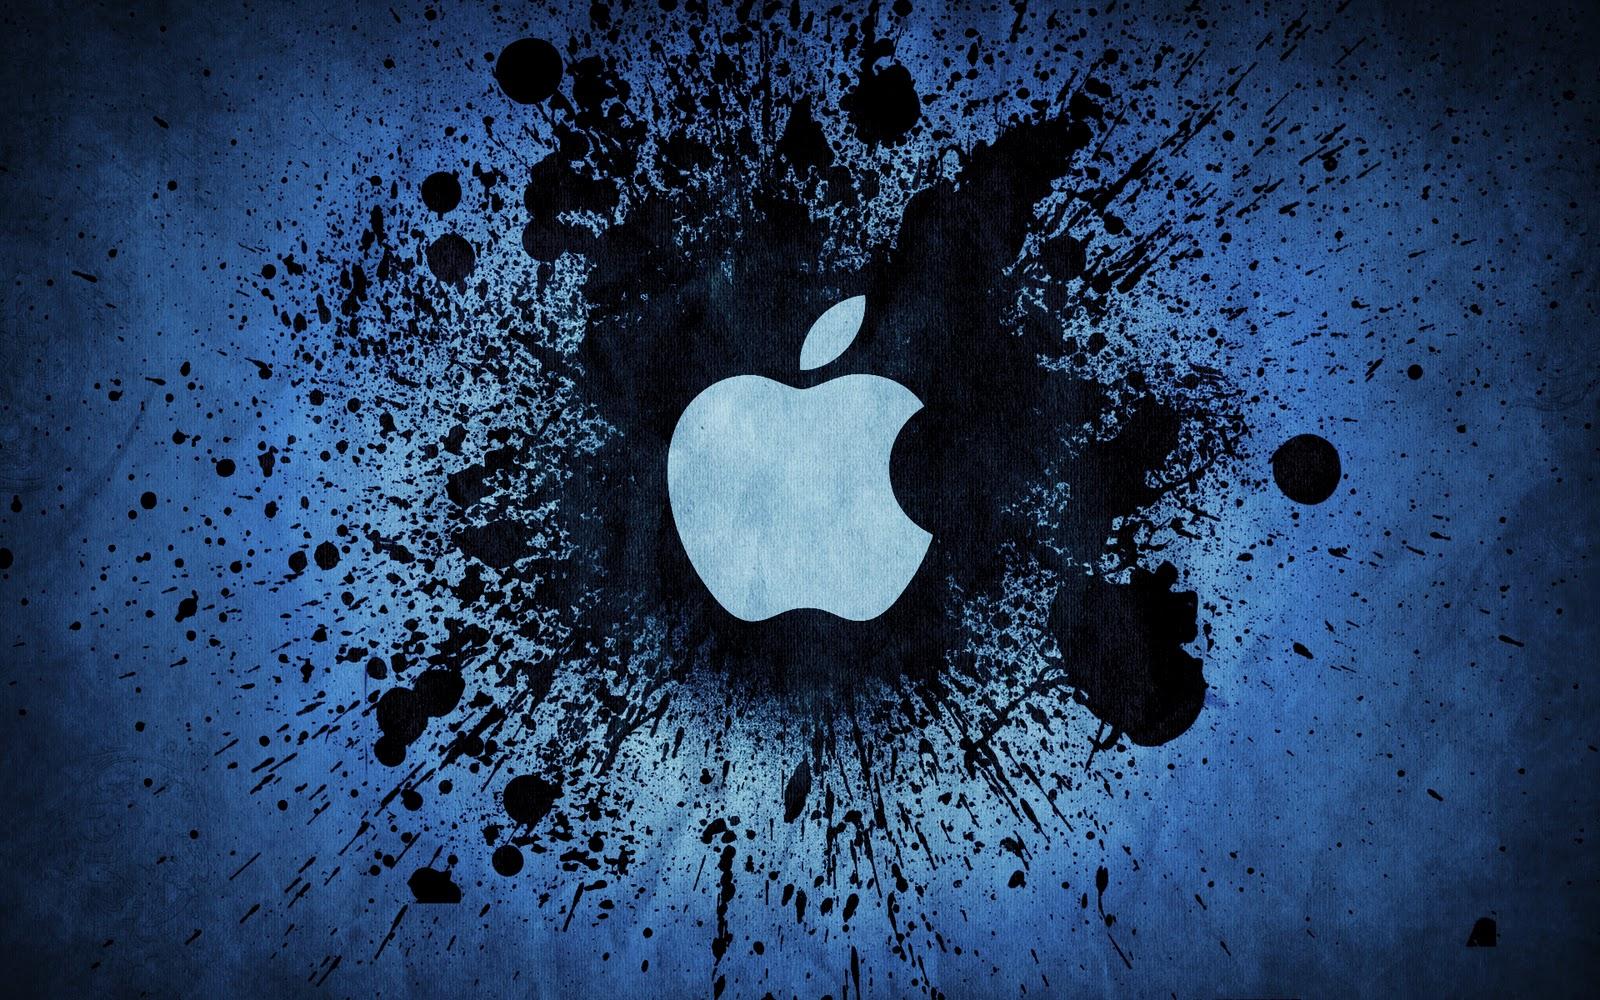 http://3.bp.blogspot.com/-0dqwXvwRXfc/To-jzYPfGWI/AAAAAAAACjQ/PHQkwI8JEPc/s1600/apple-plano-de-fundo-2.jpg